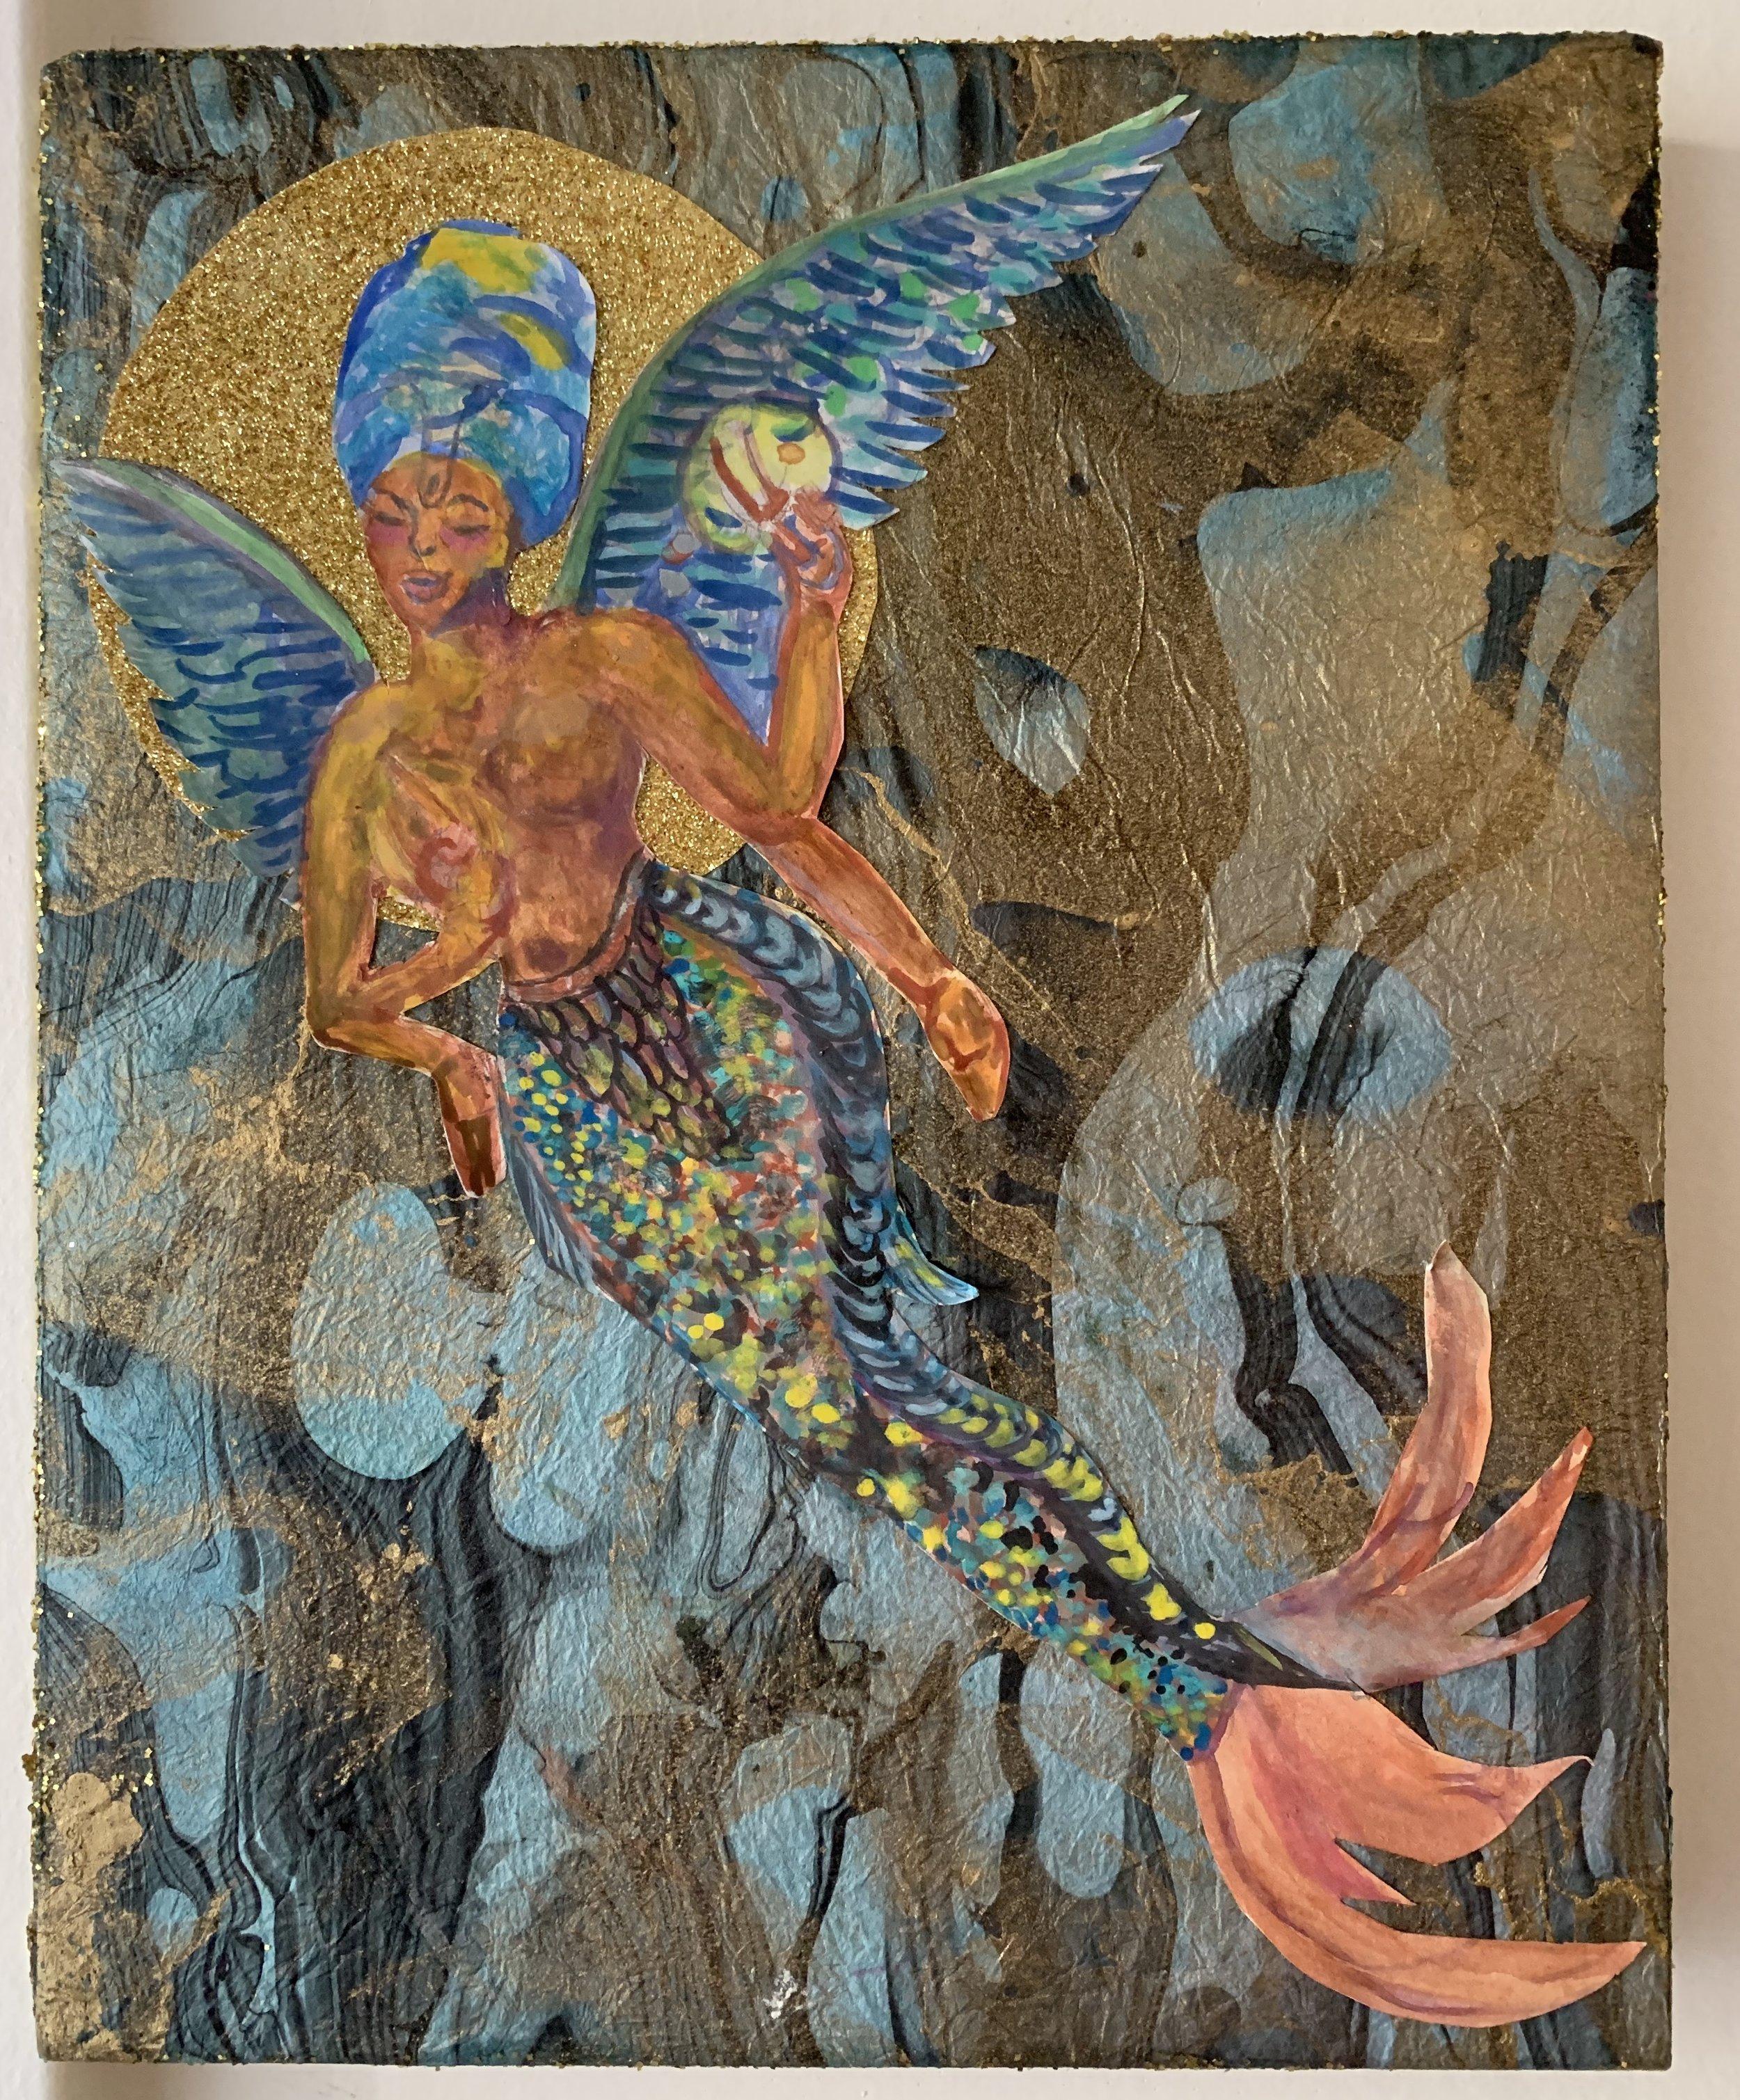 Spiritual Mermaid - (by Marlena) created in 2014